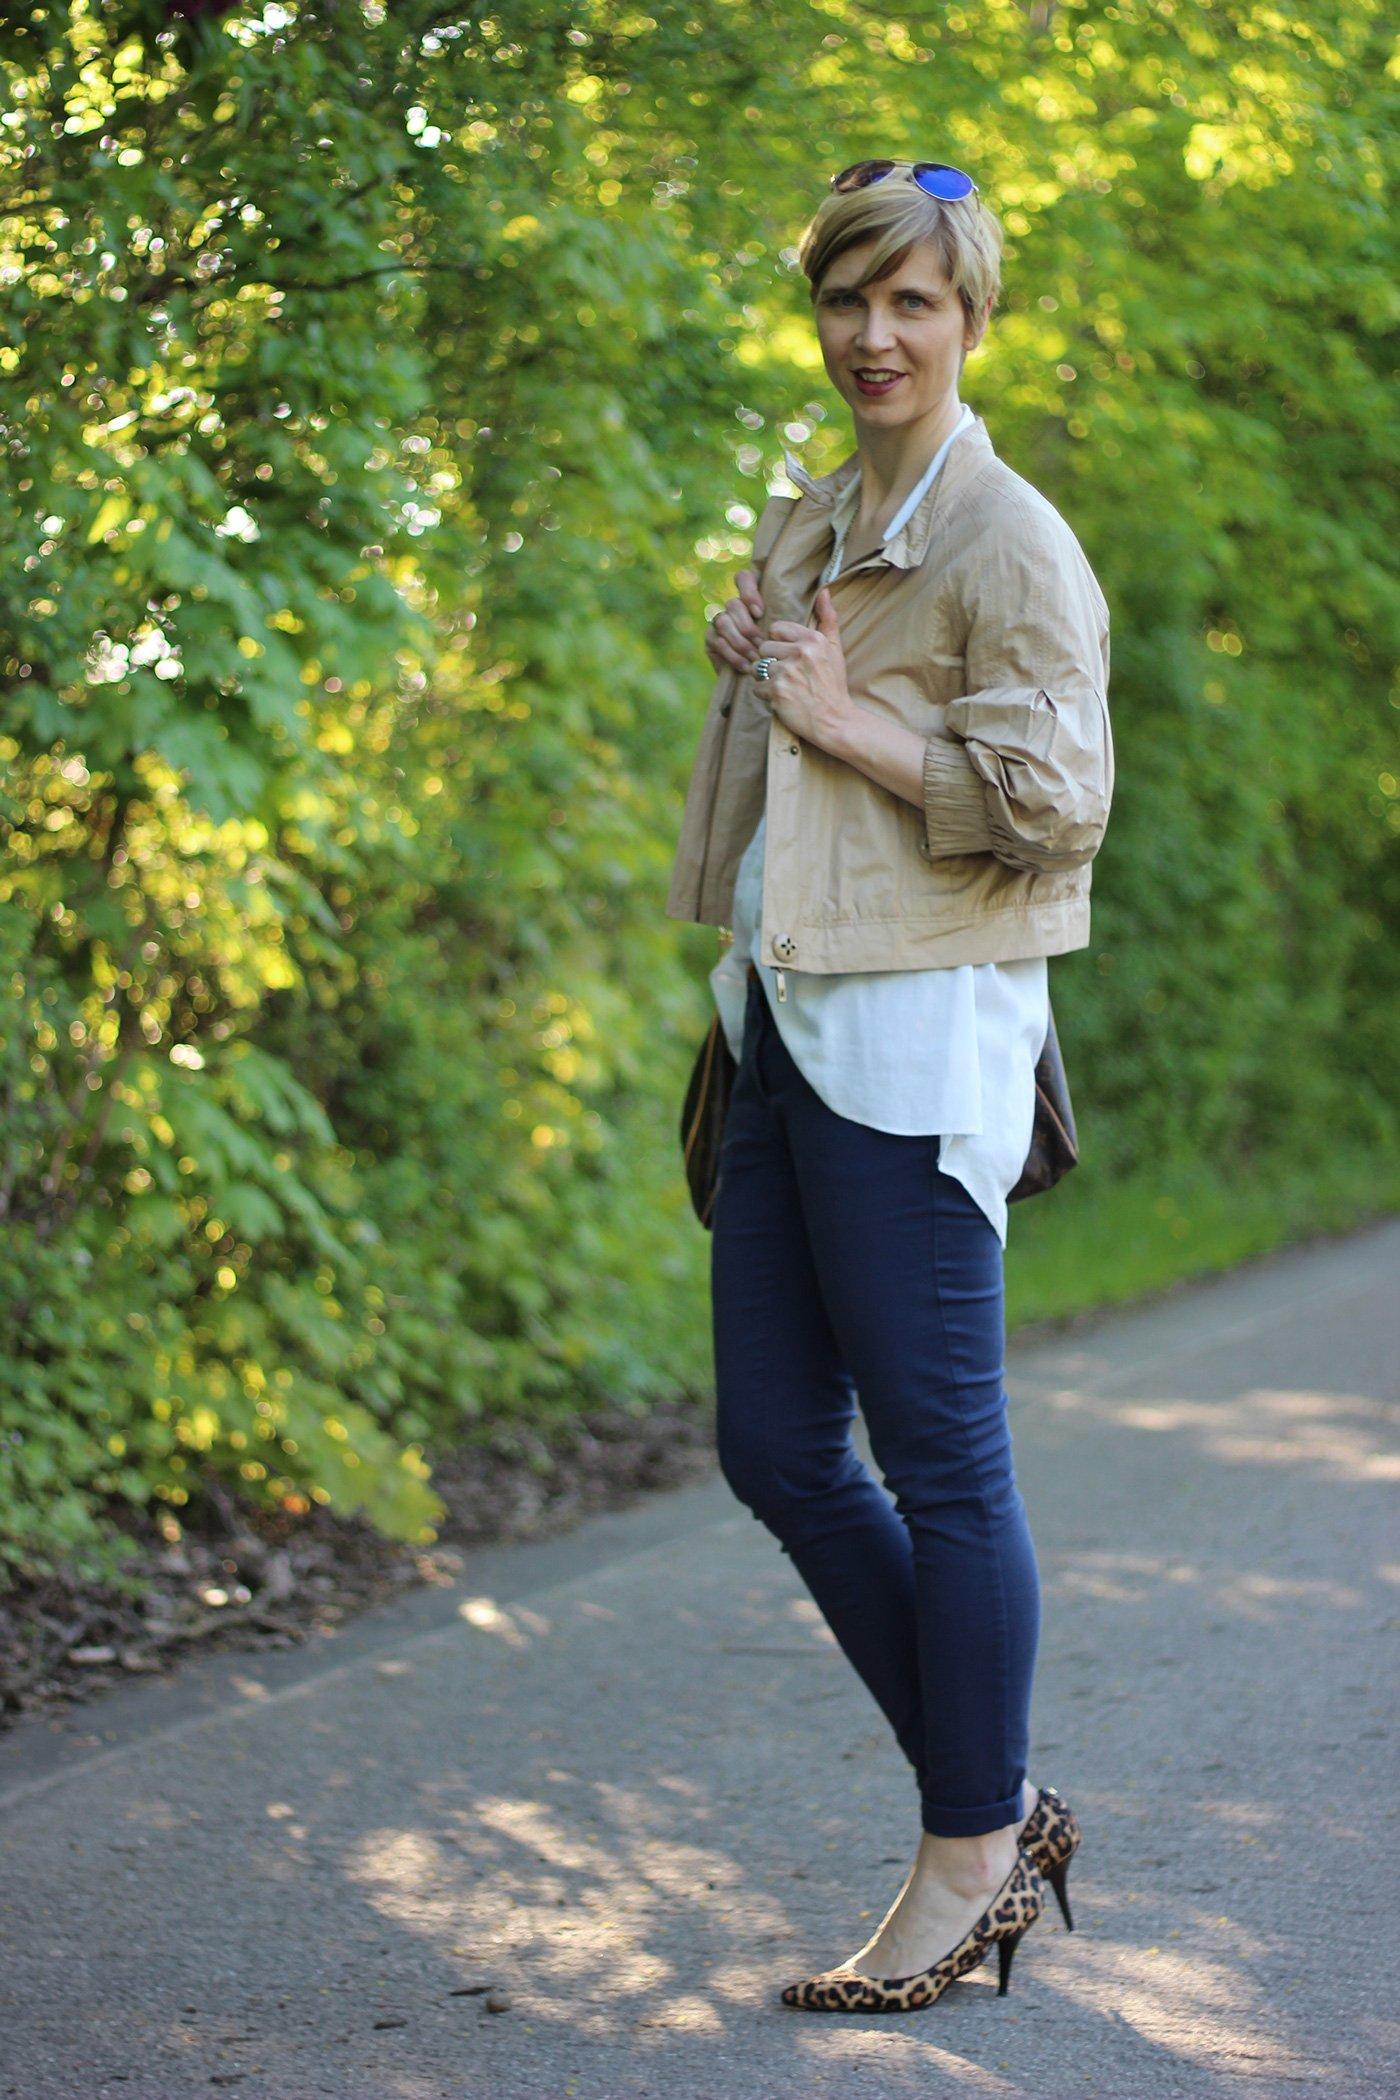 IMG_4095a_leo_leopumps_blue_blau_Lace_Spitze_Bluse_Stellaanddot_Outfit_AHemadundaHos_Conny_Fashion_Modeblog_Escada